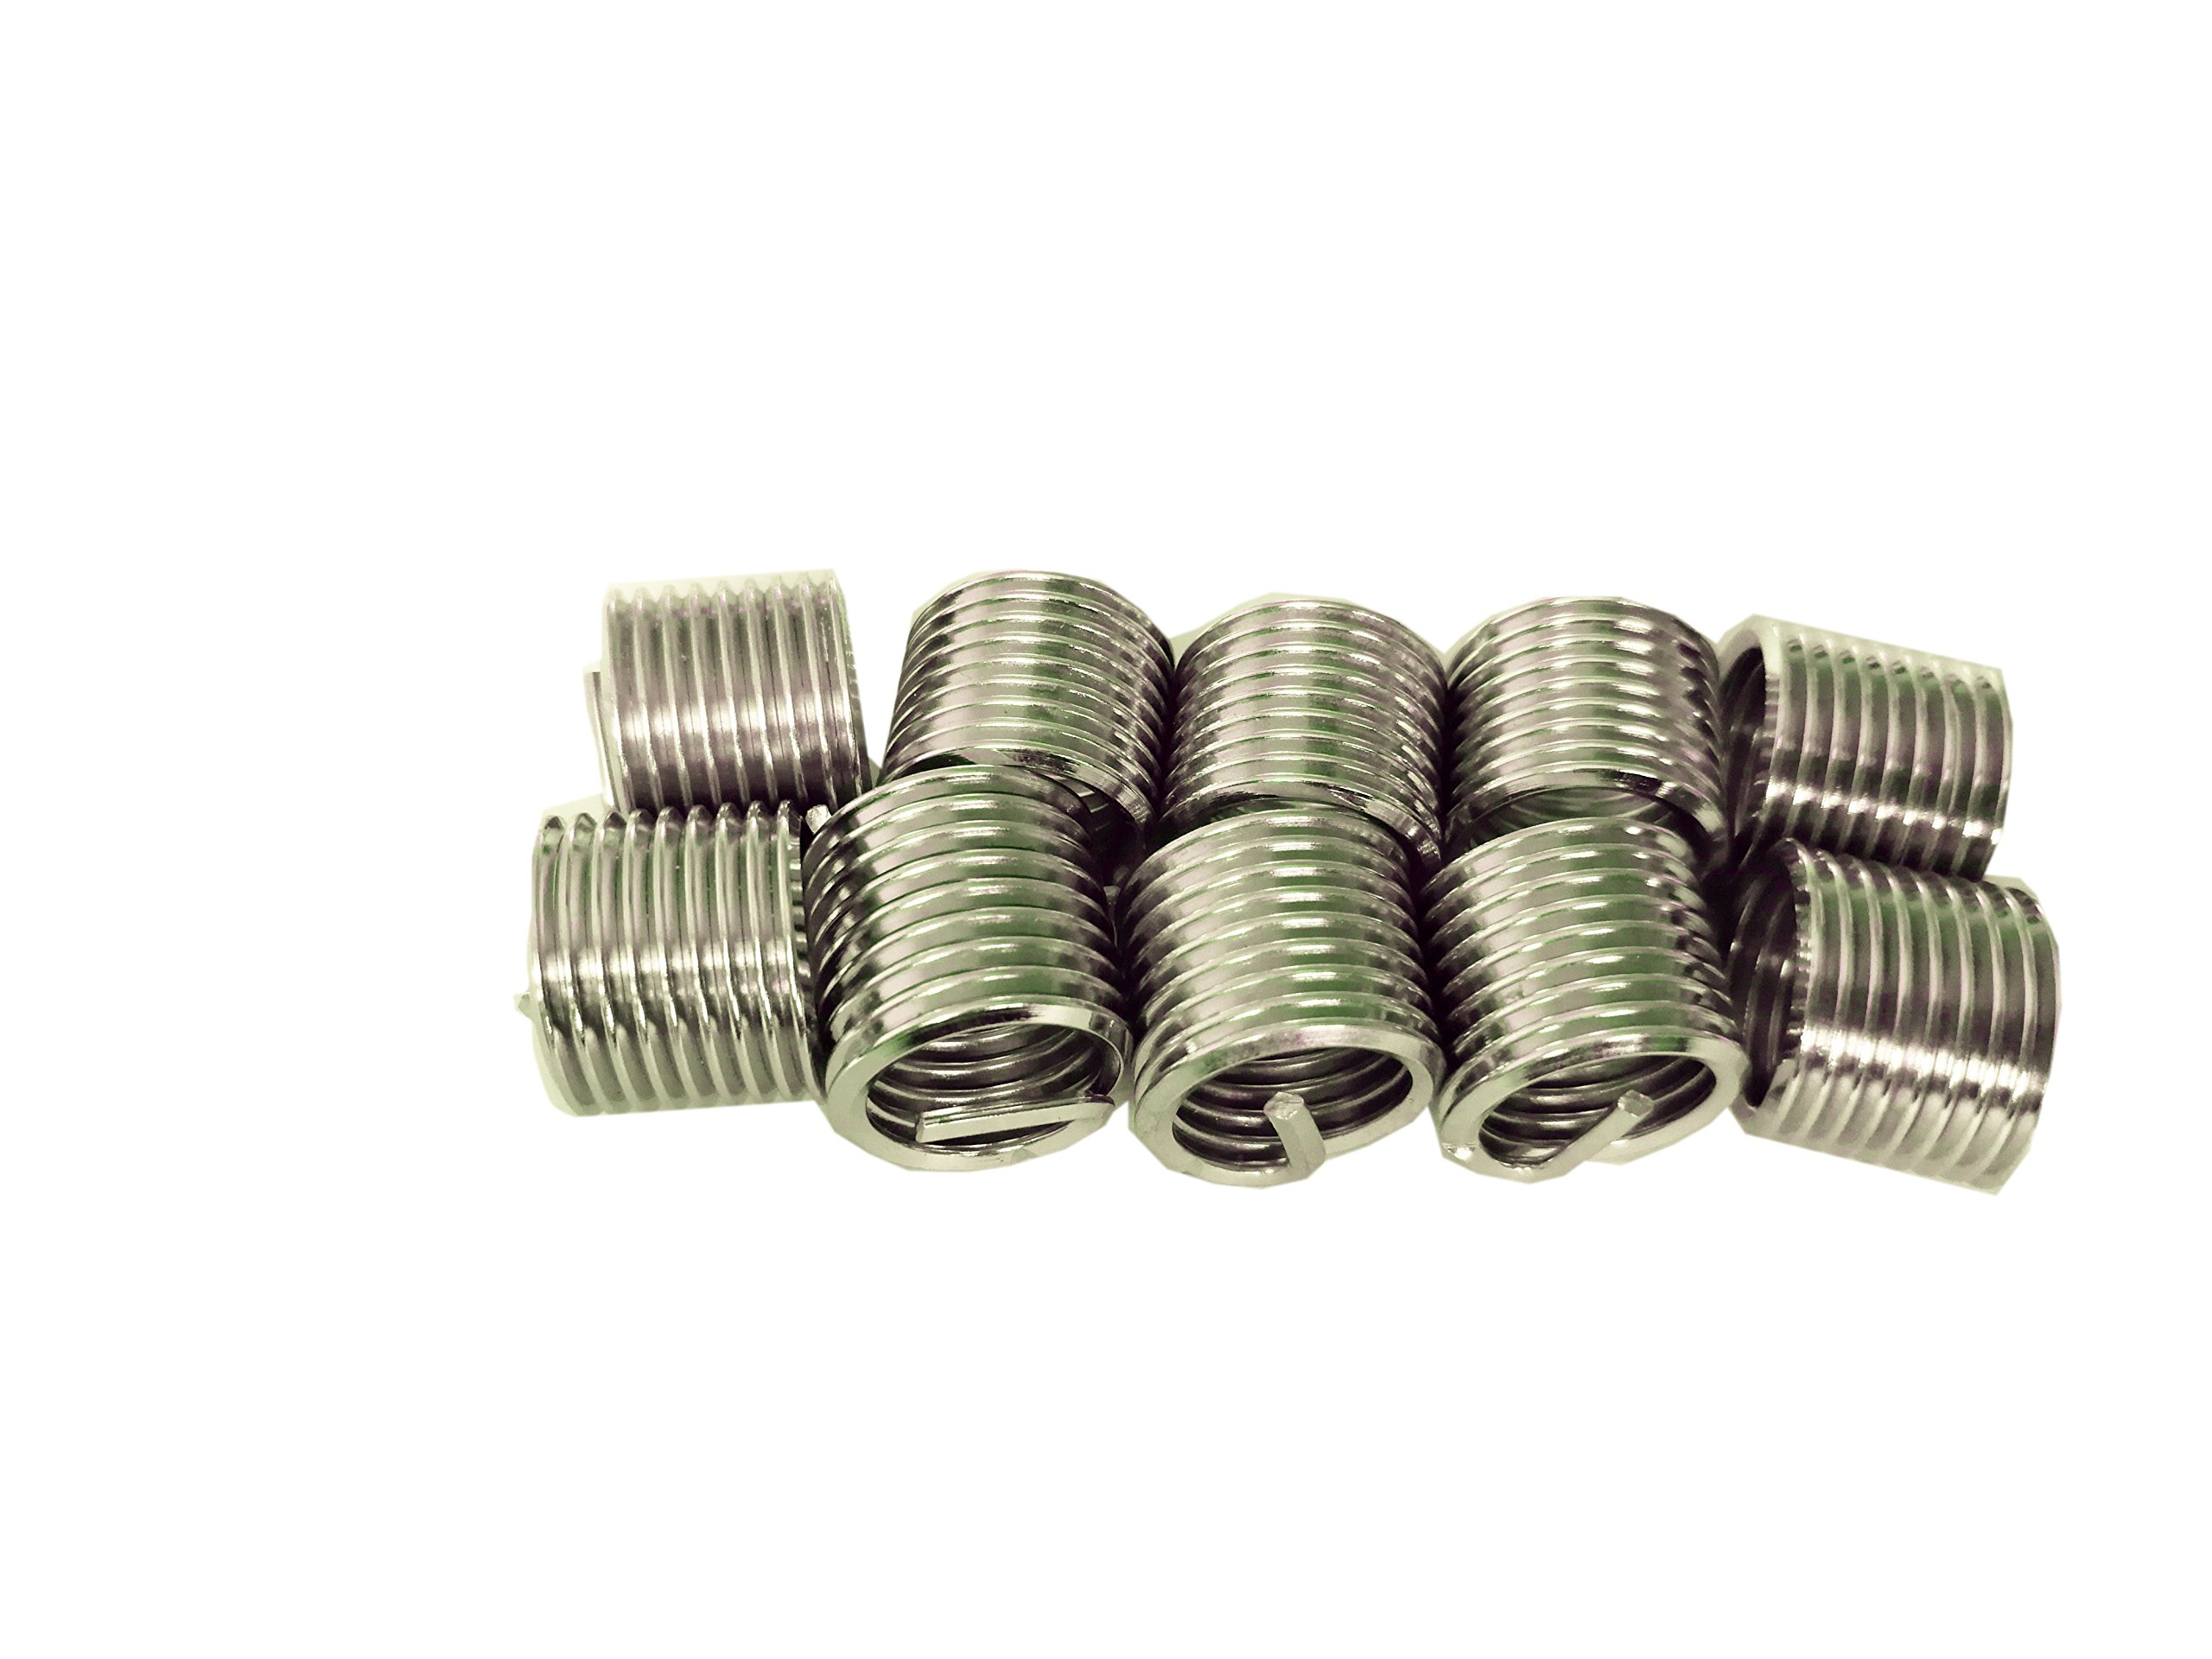 Delisert Type Free Running M8X1.0X1D 304 Stainless Steel Thread Insert 1000pcs